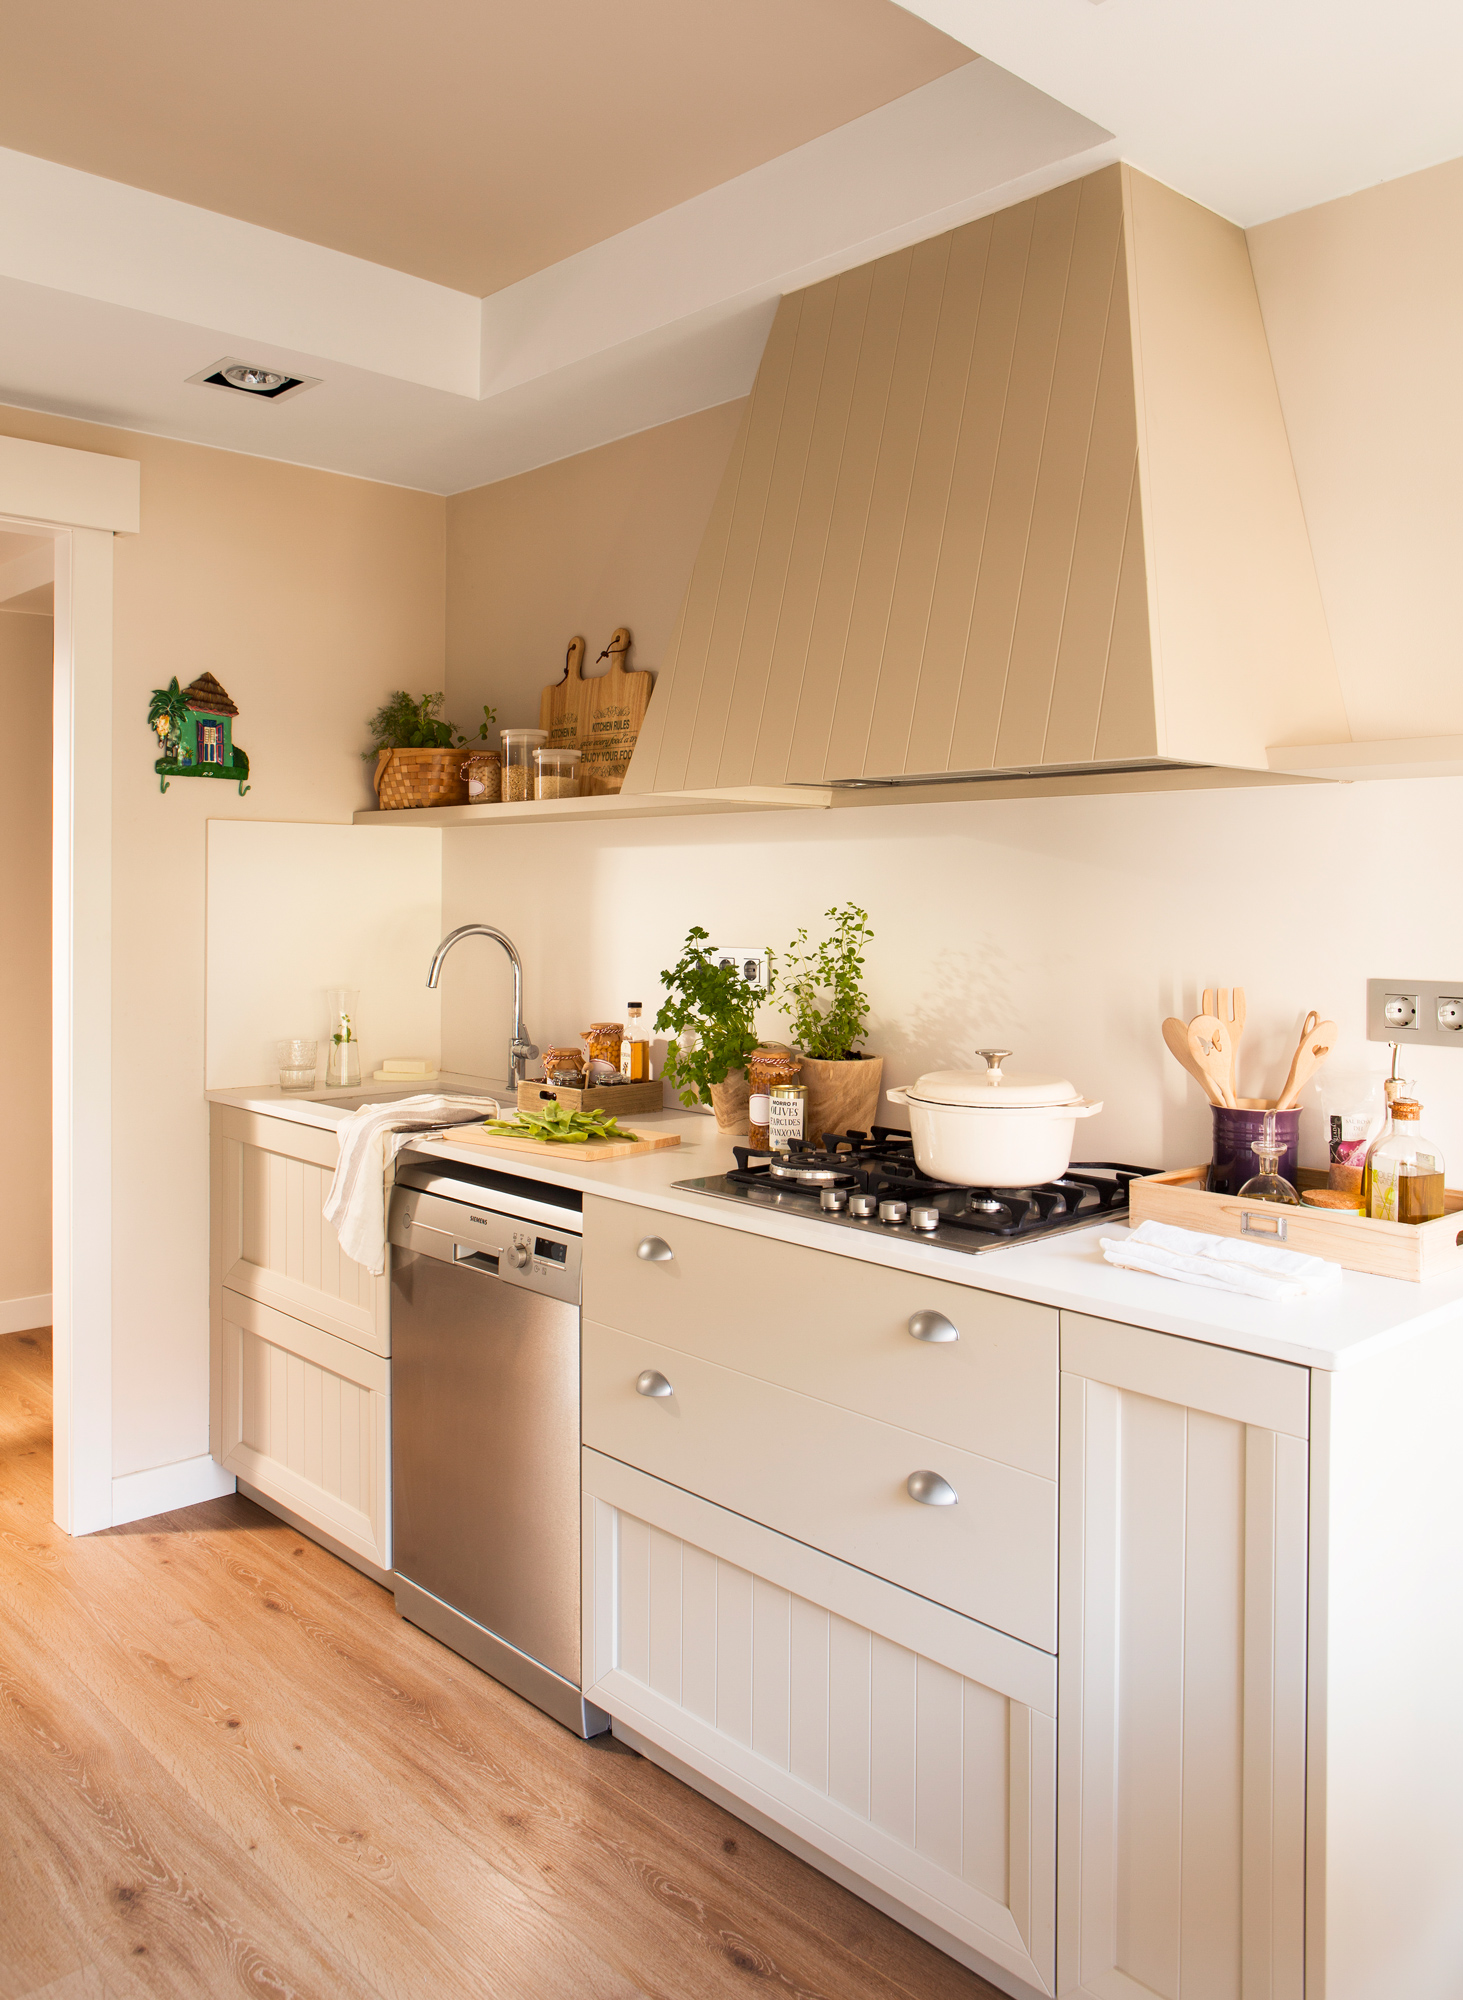 Limpiar muebles de cocina de madera dise os for Muebles de cocina de madera